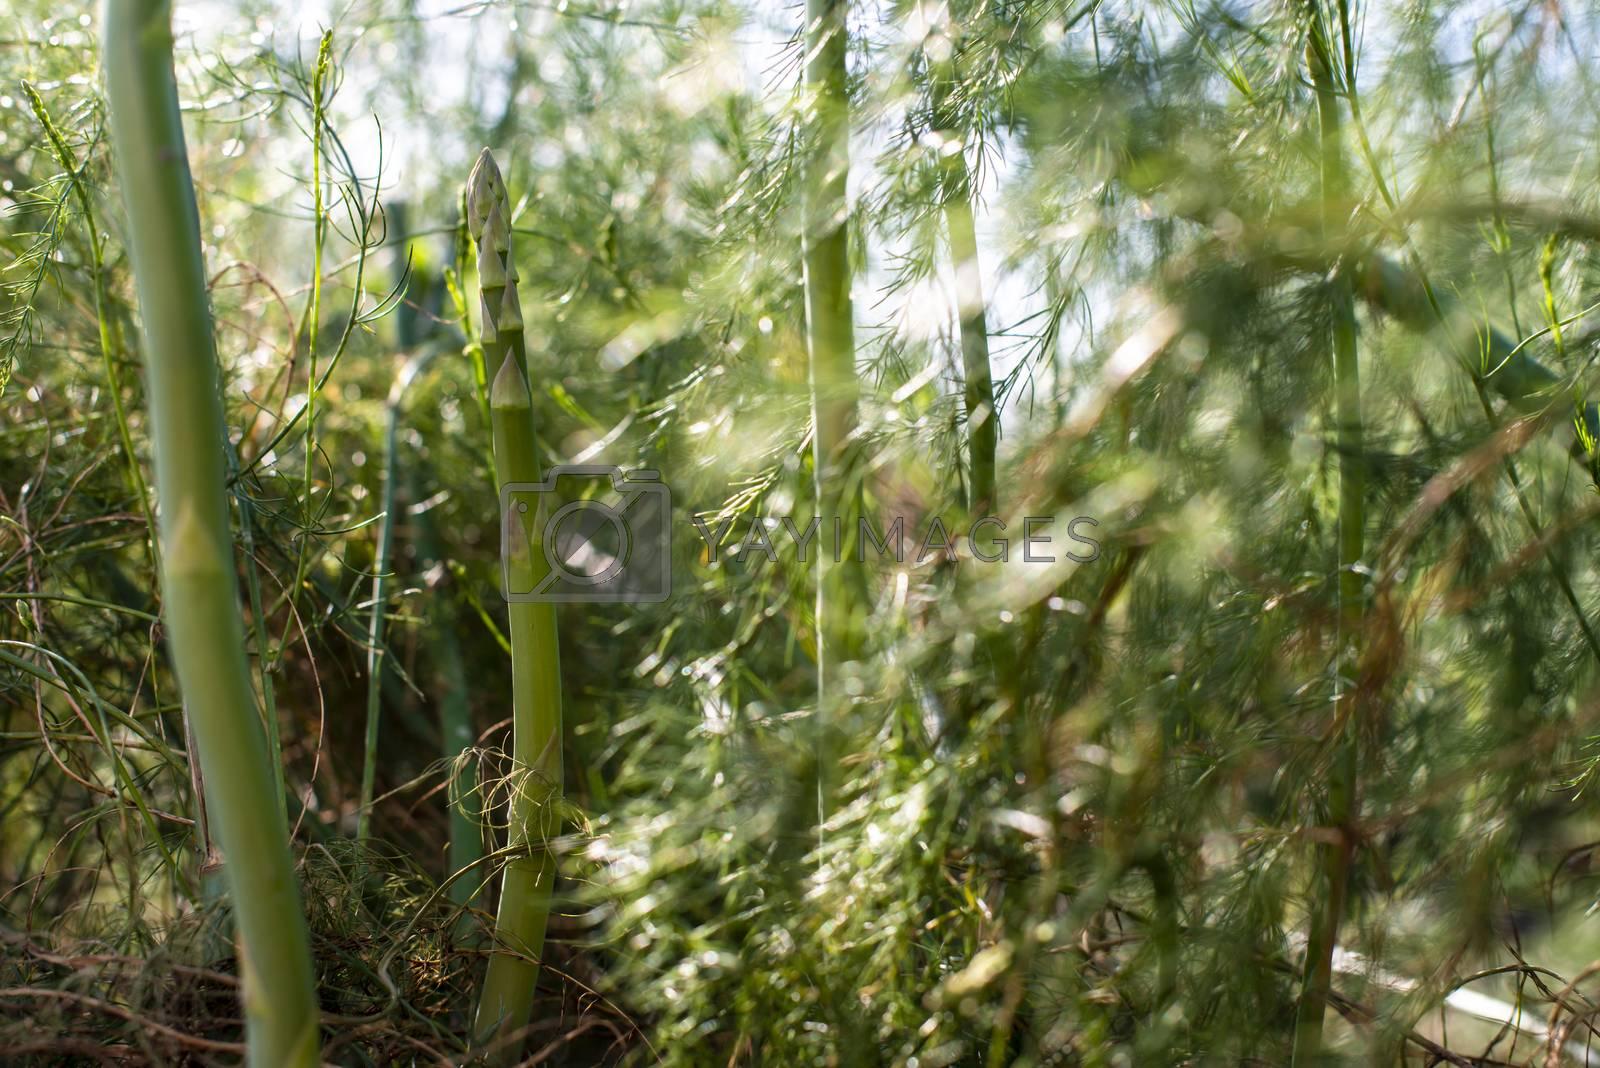 Asparagus plants in the nature. Close-up asparagus. Asparagus in industrial farm.